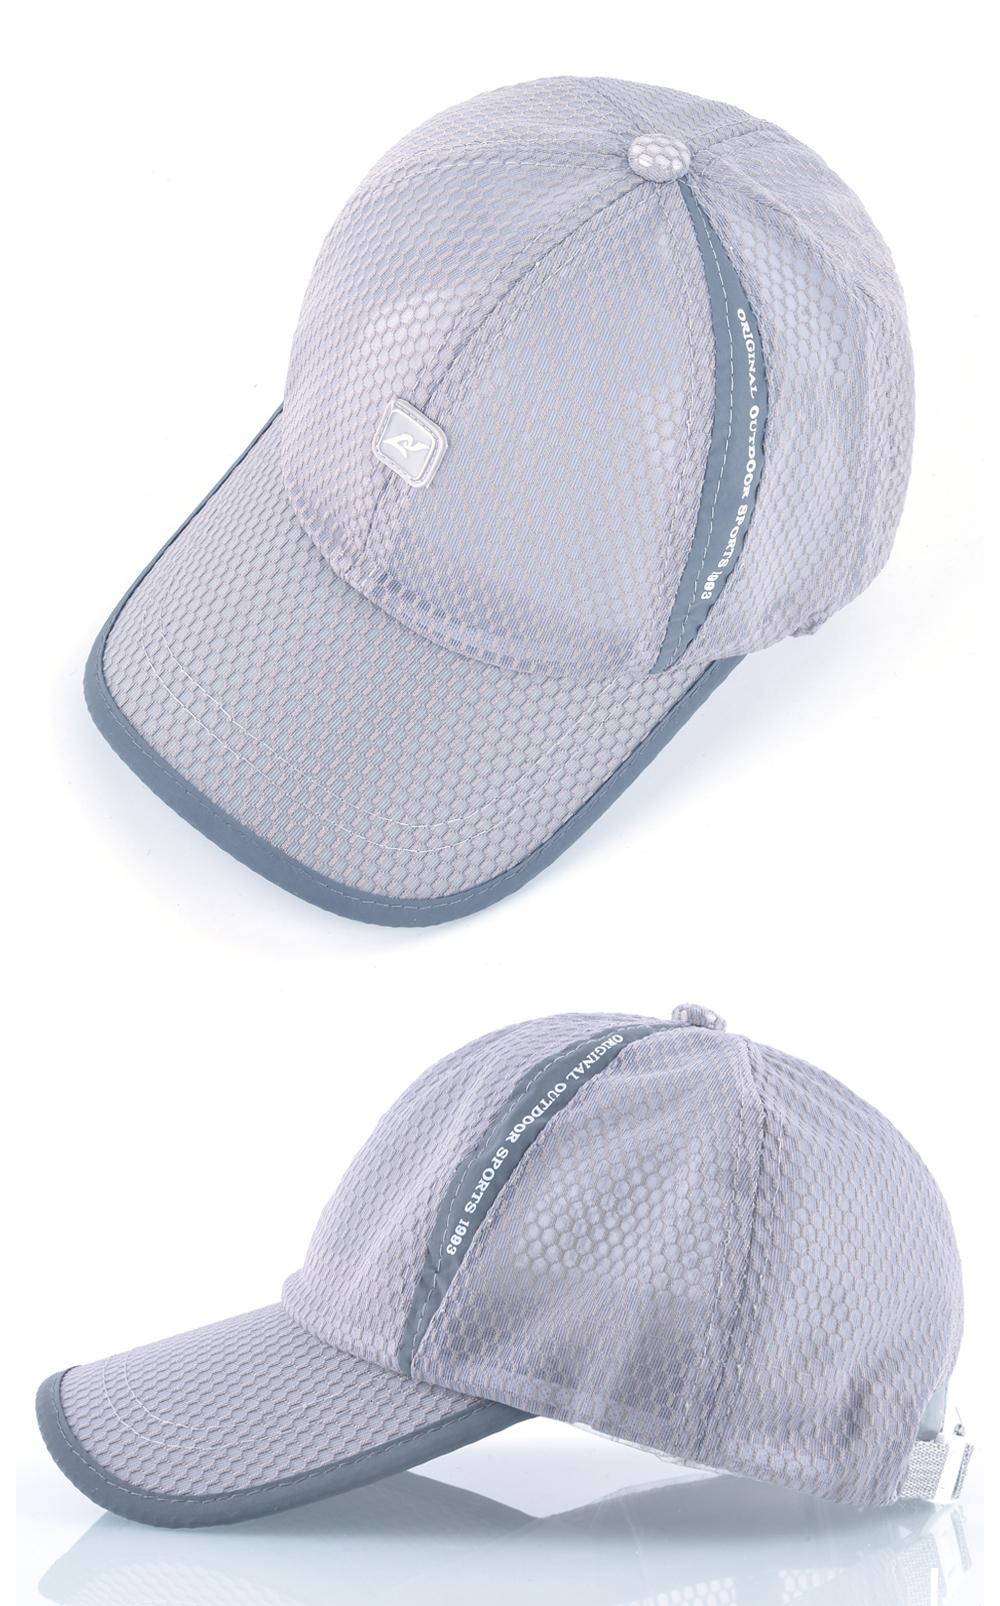 Open Mesh Breathable Baseball Cap - Overhead and Side Views